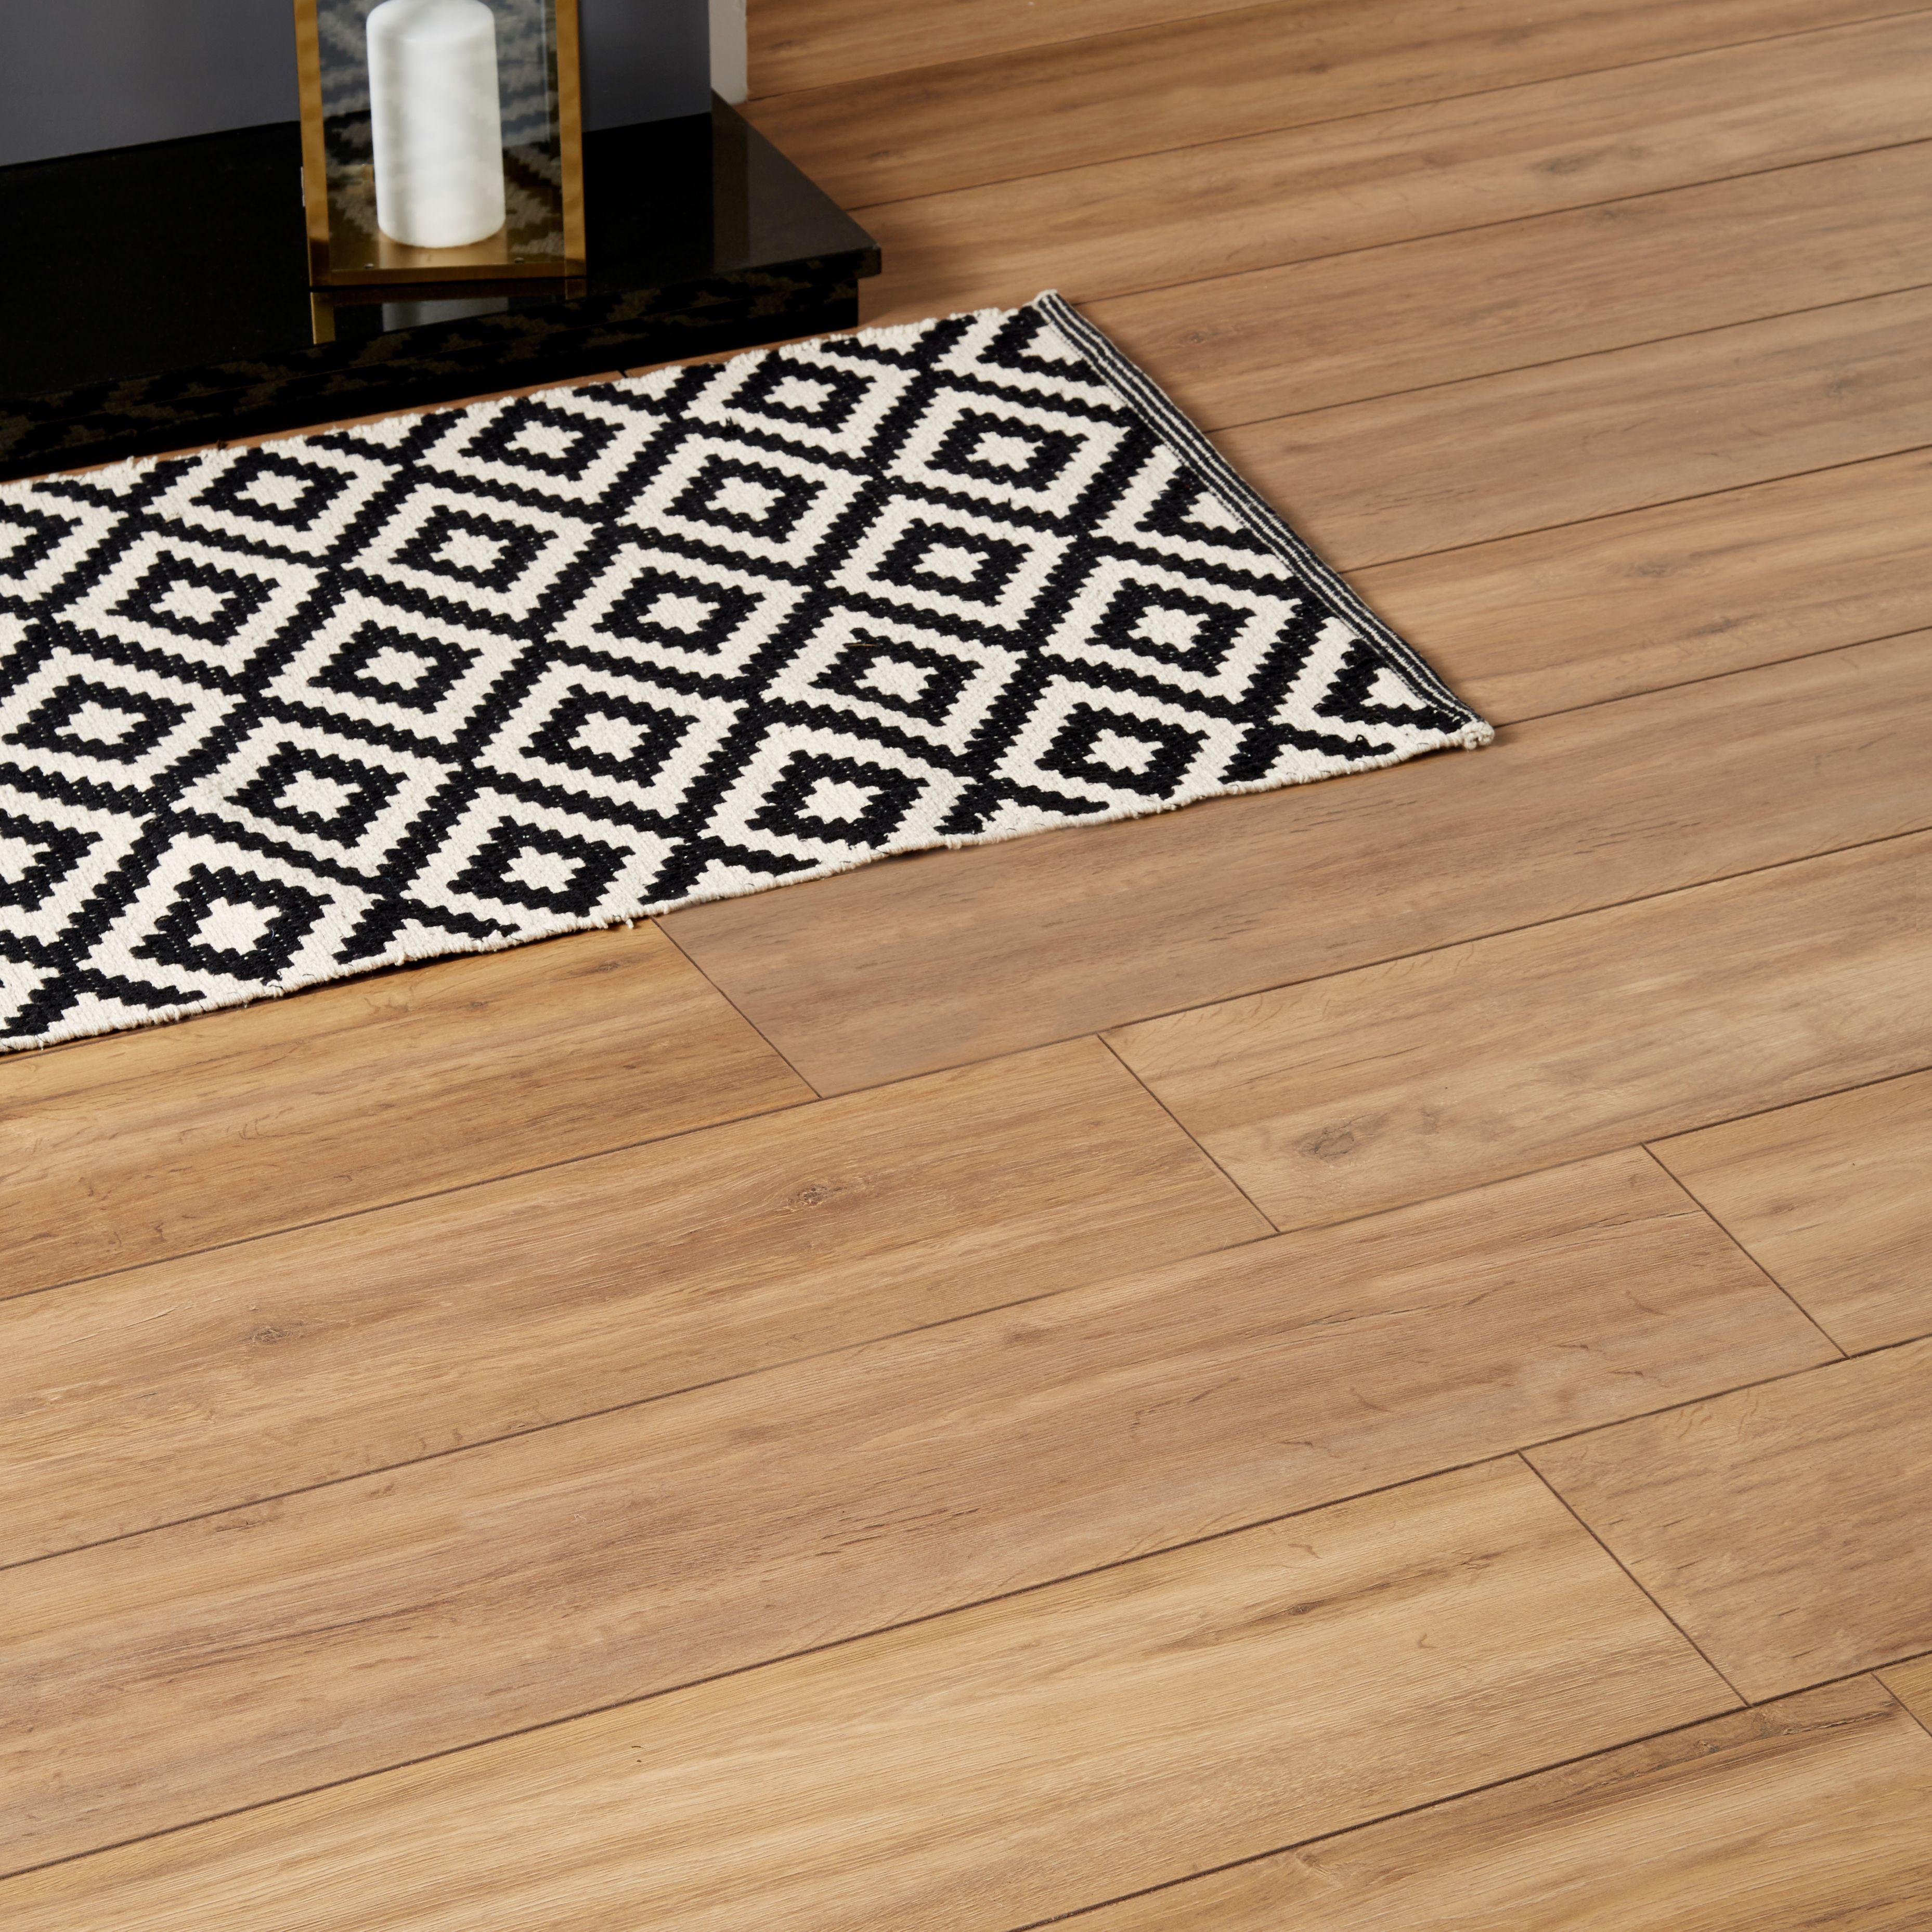 Devonport Natural Oak Effect Laminate Flooring M² Pack - Cheap laminate flooring packs